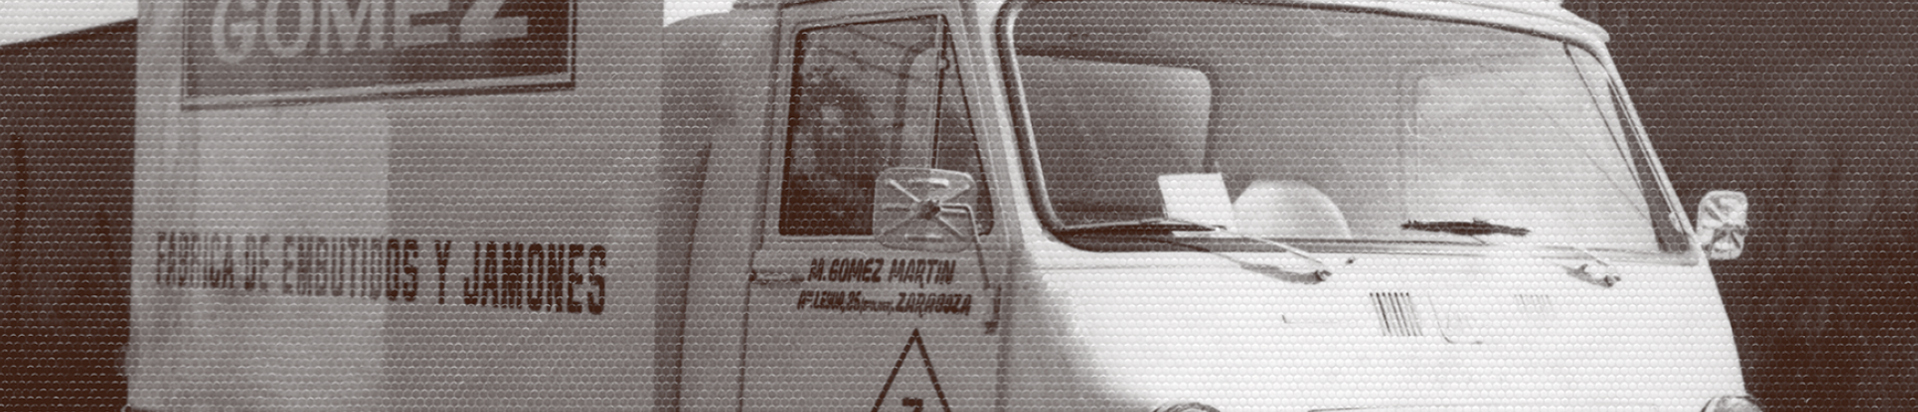 Transporte - Mejor jamón de Teruel